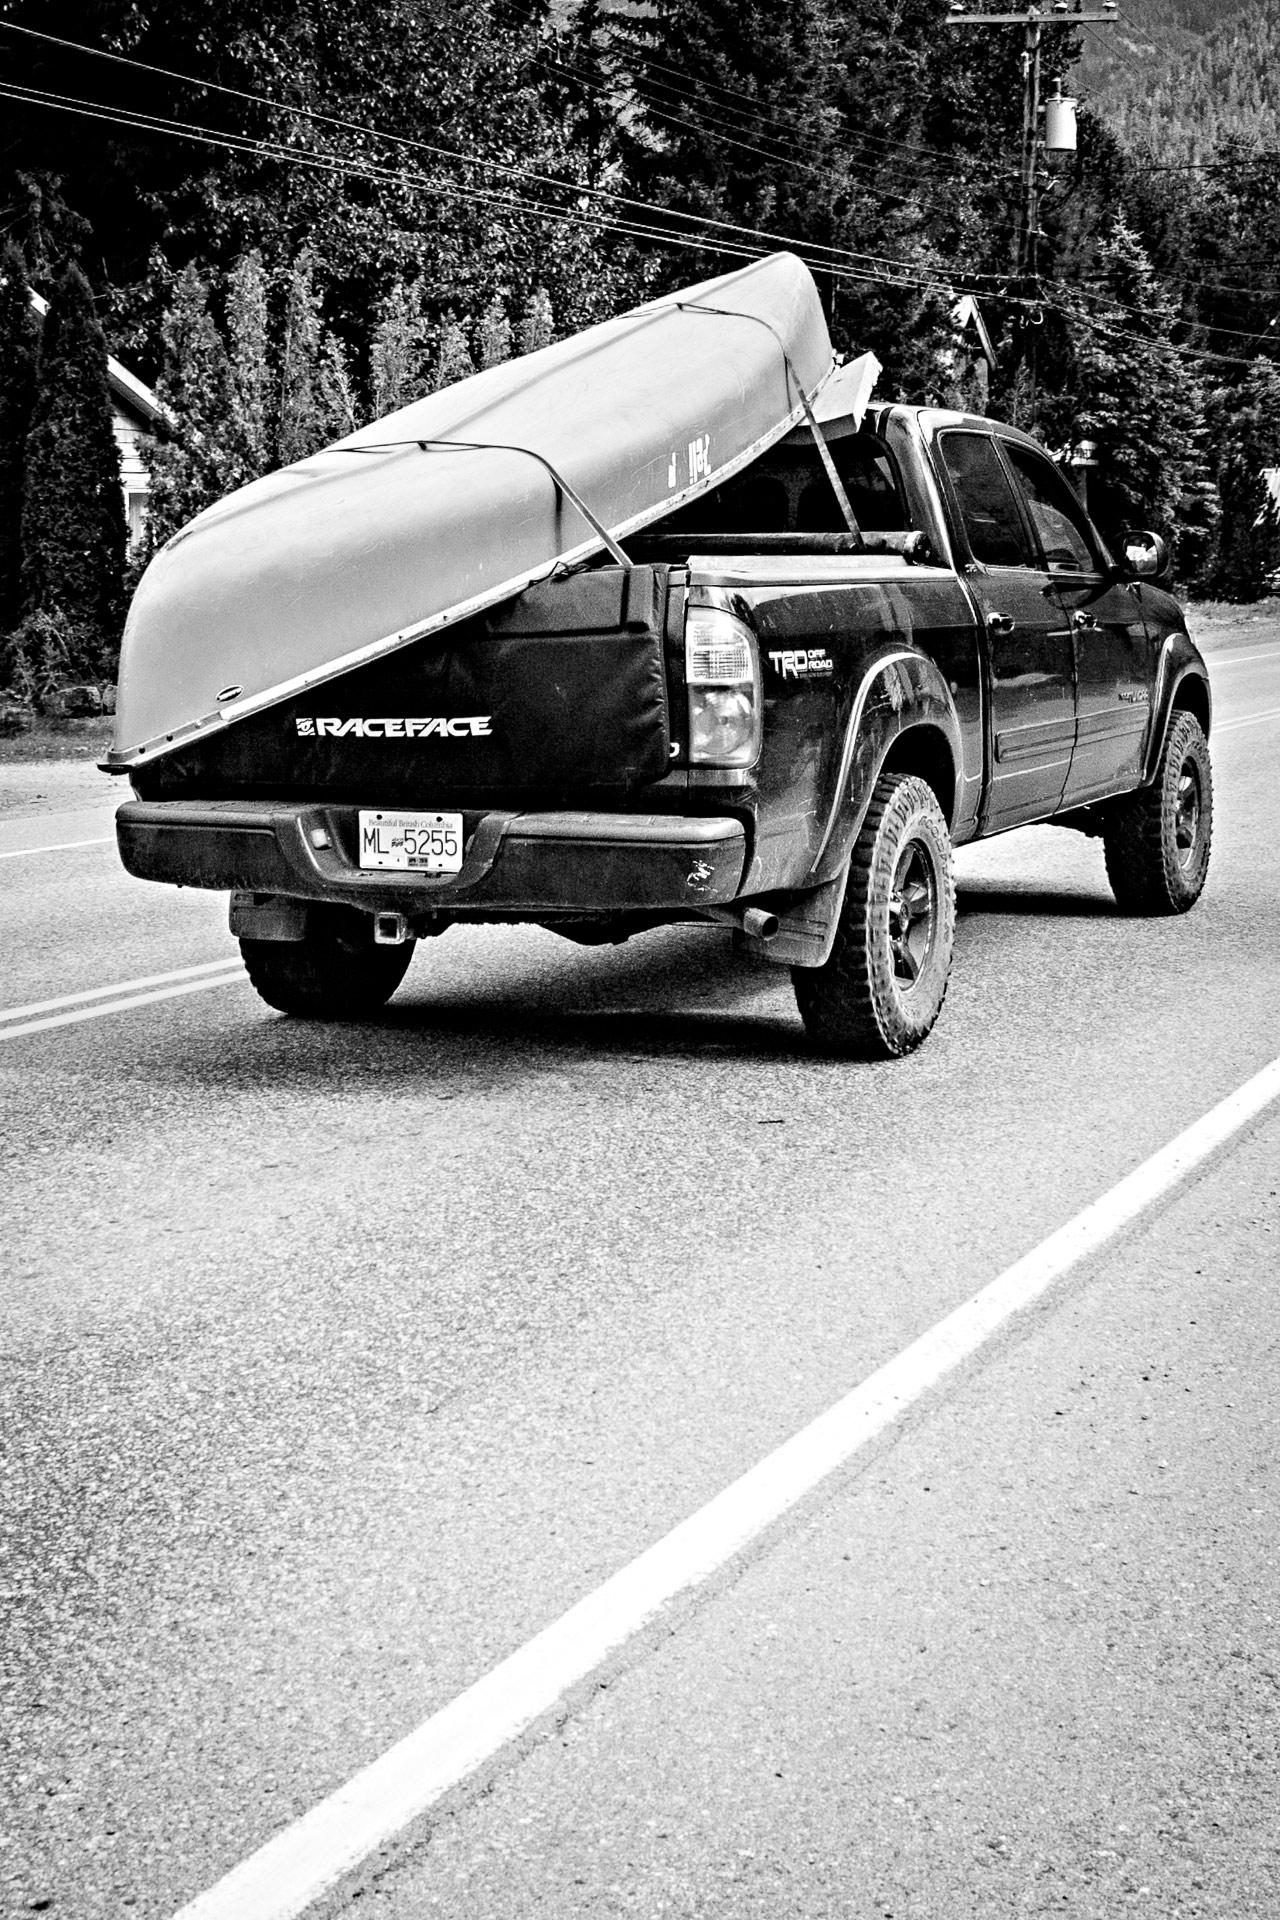 canot pick up Alberta Canada